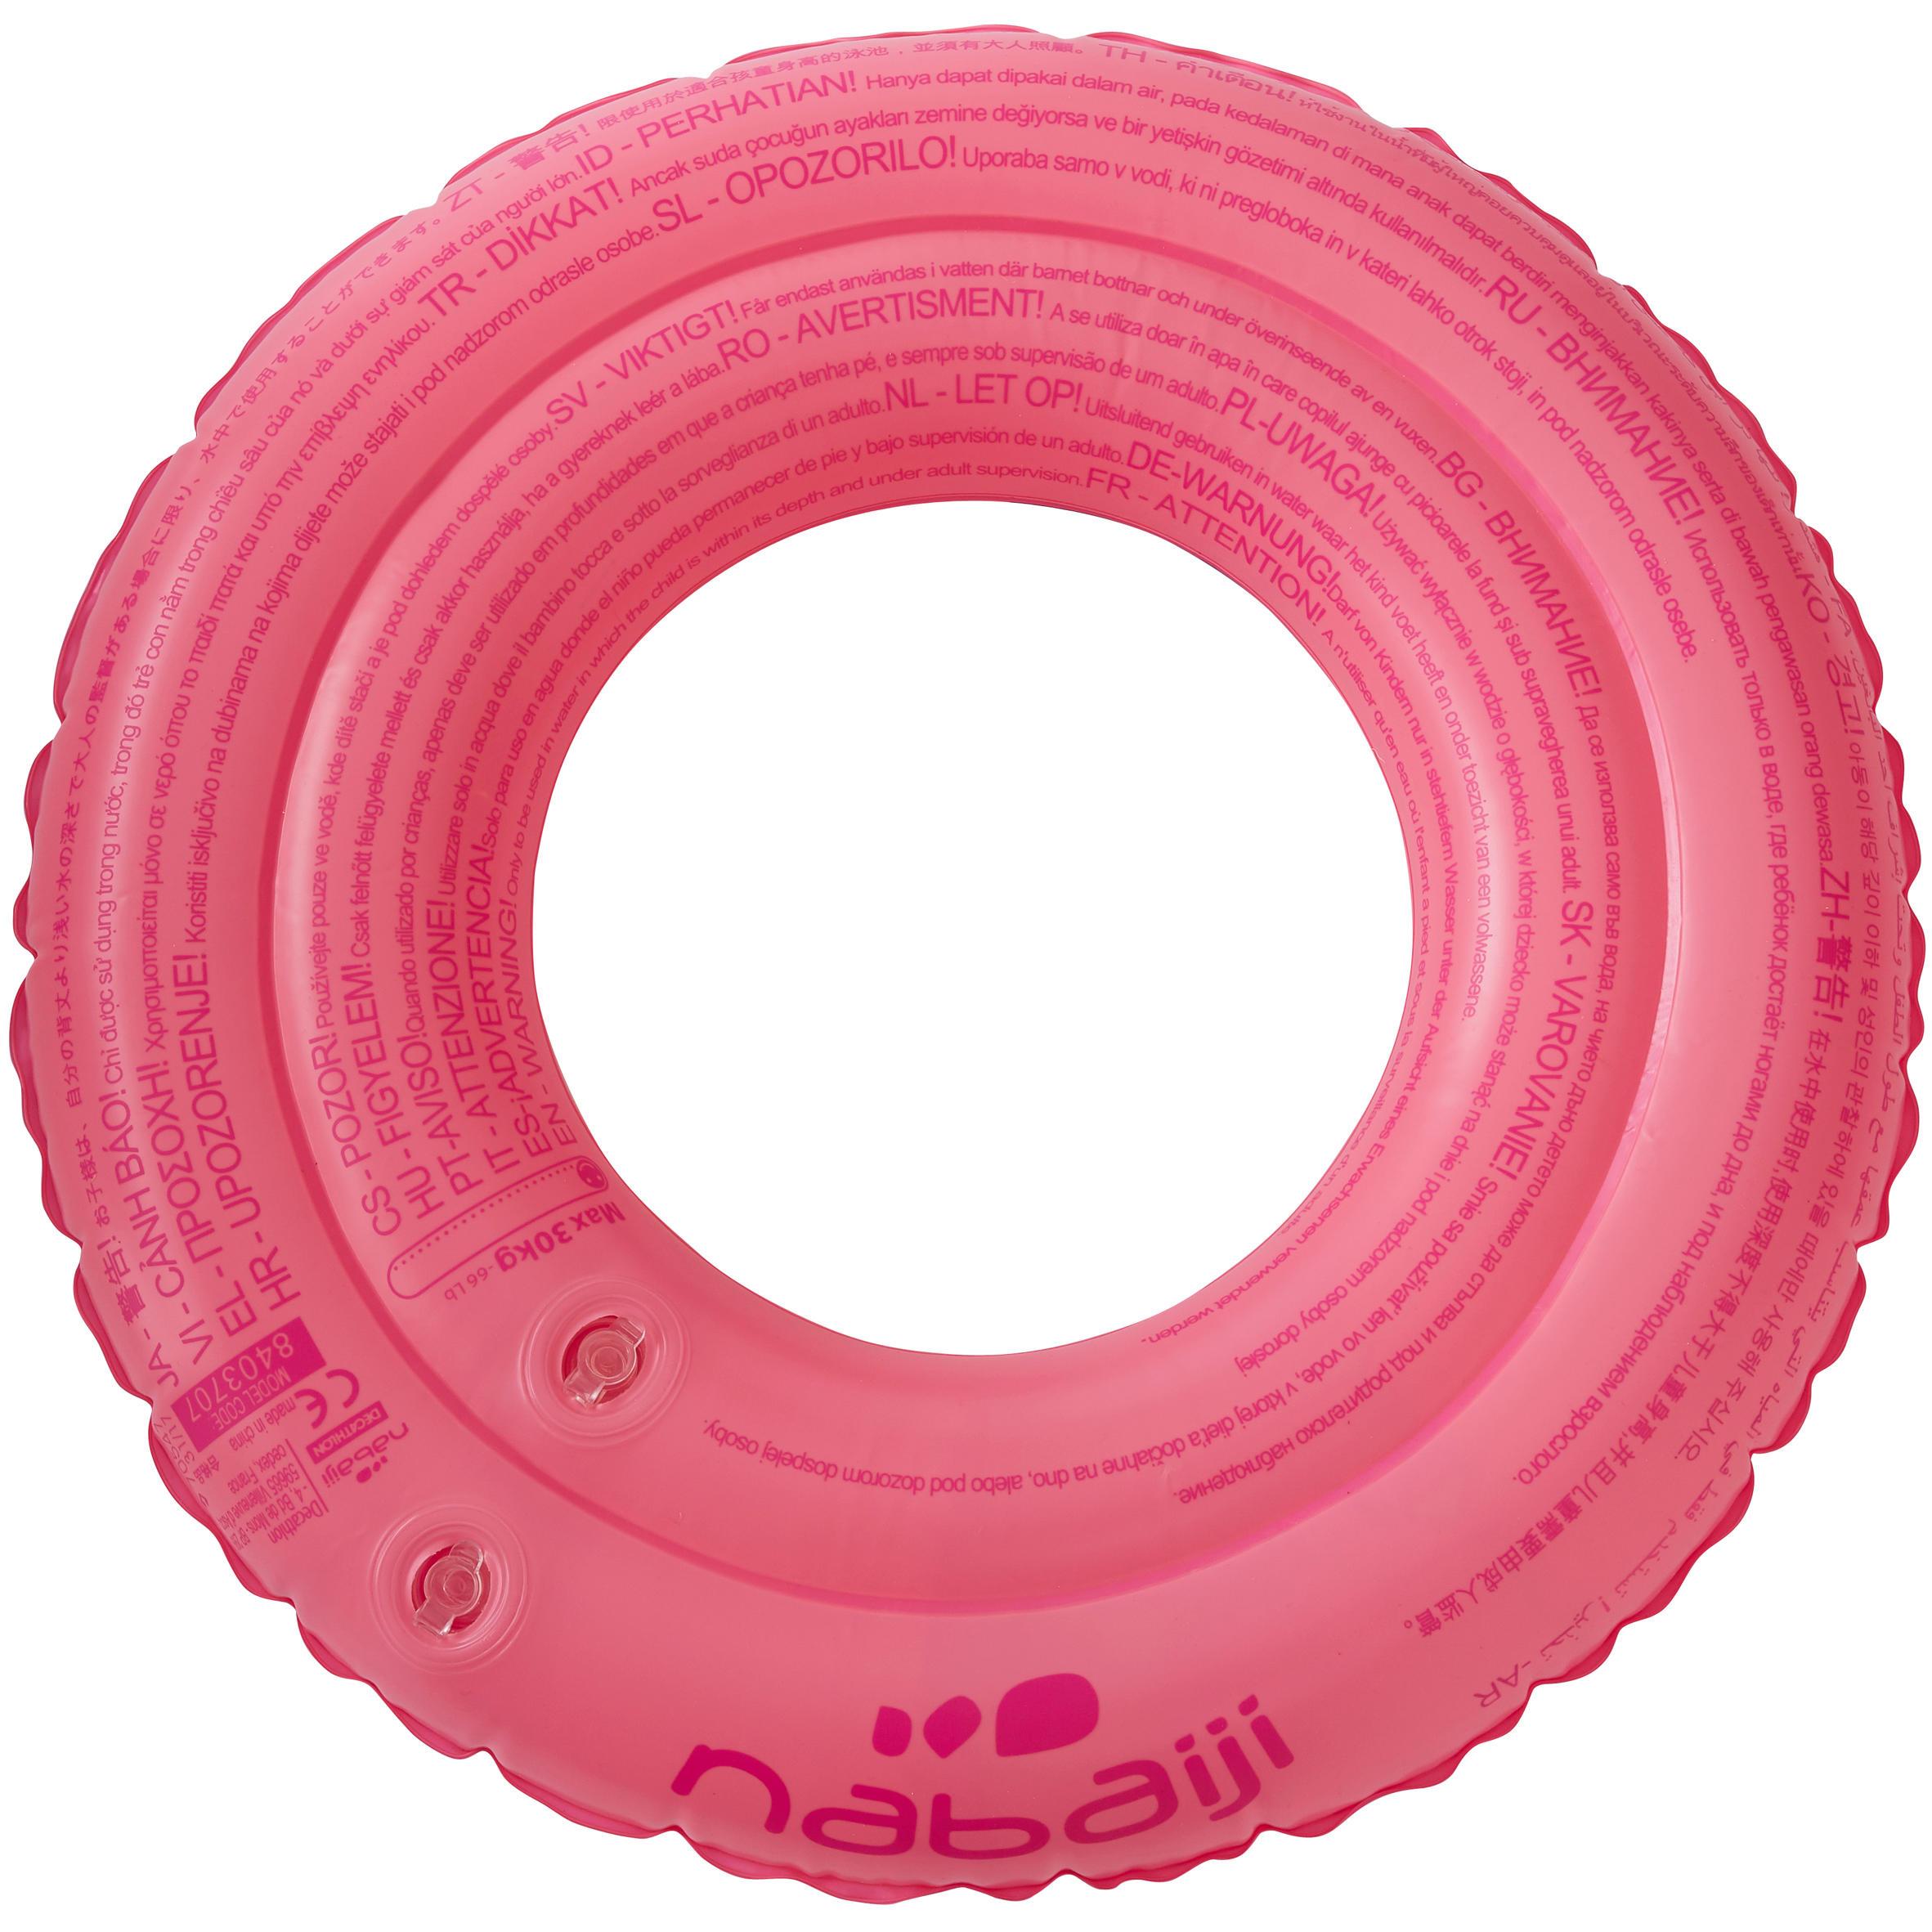 Children's Inflatable Swim Ring 3-6 Years 51 cm - Flamingo Print Blue